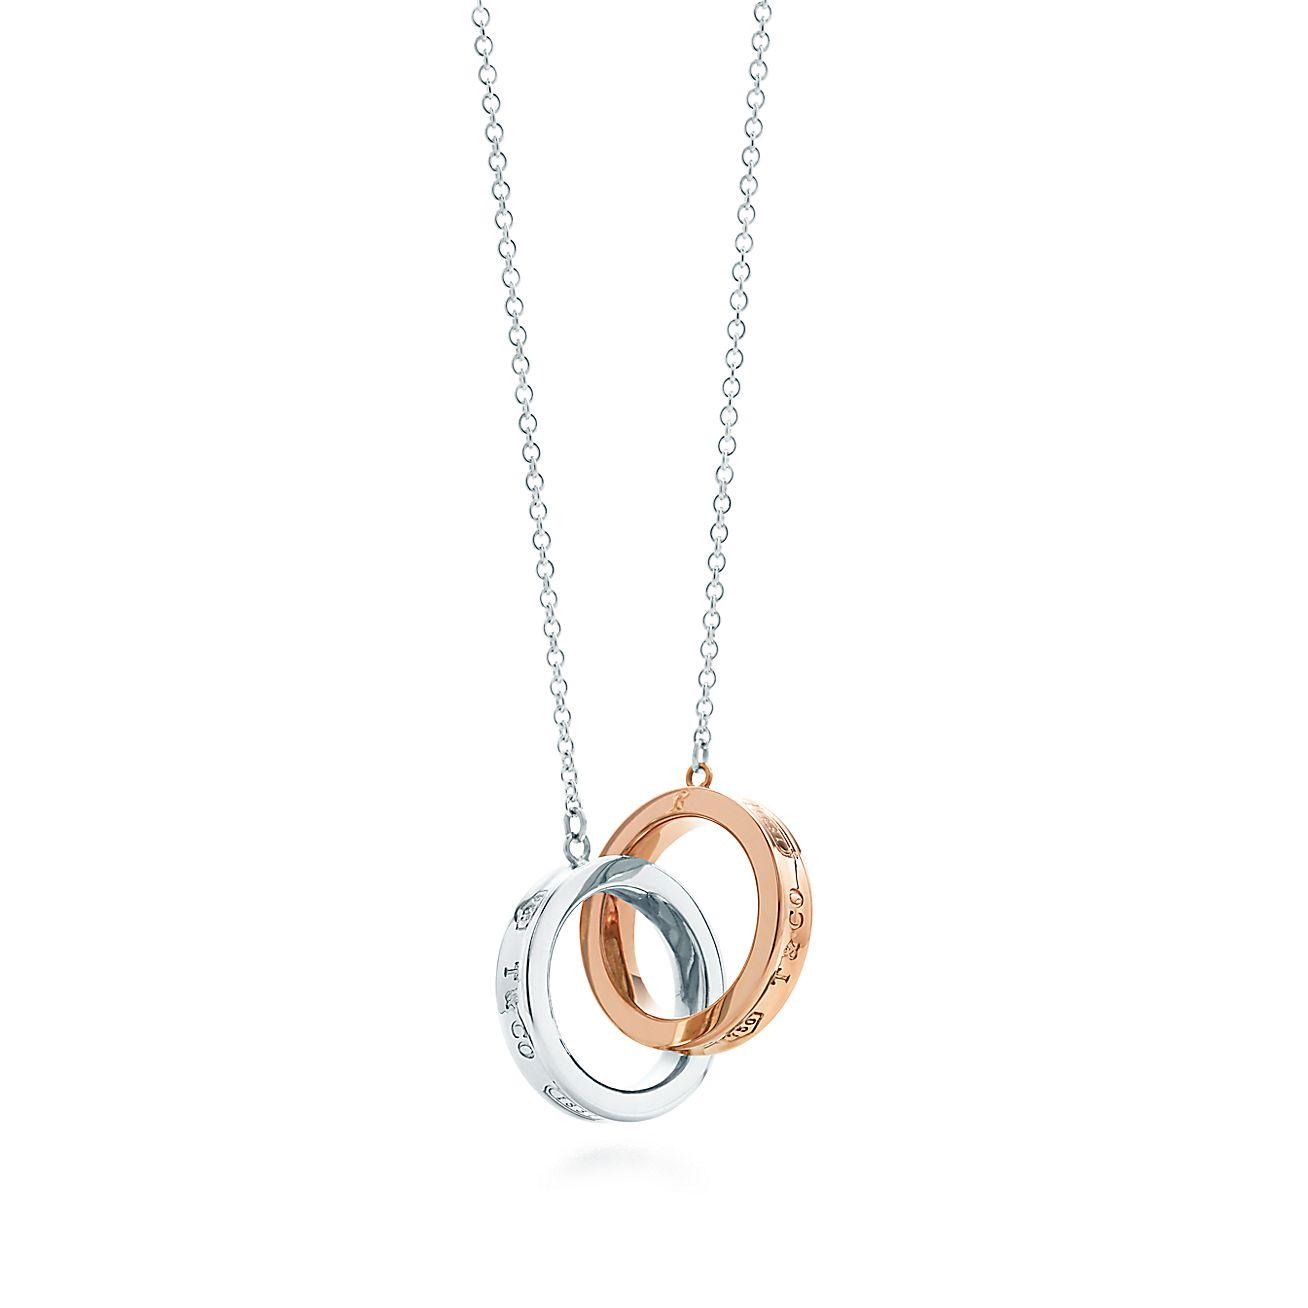 Tiffany 1837 174 Interlocking Circles Pendant In Sterling